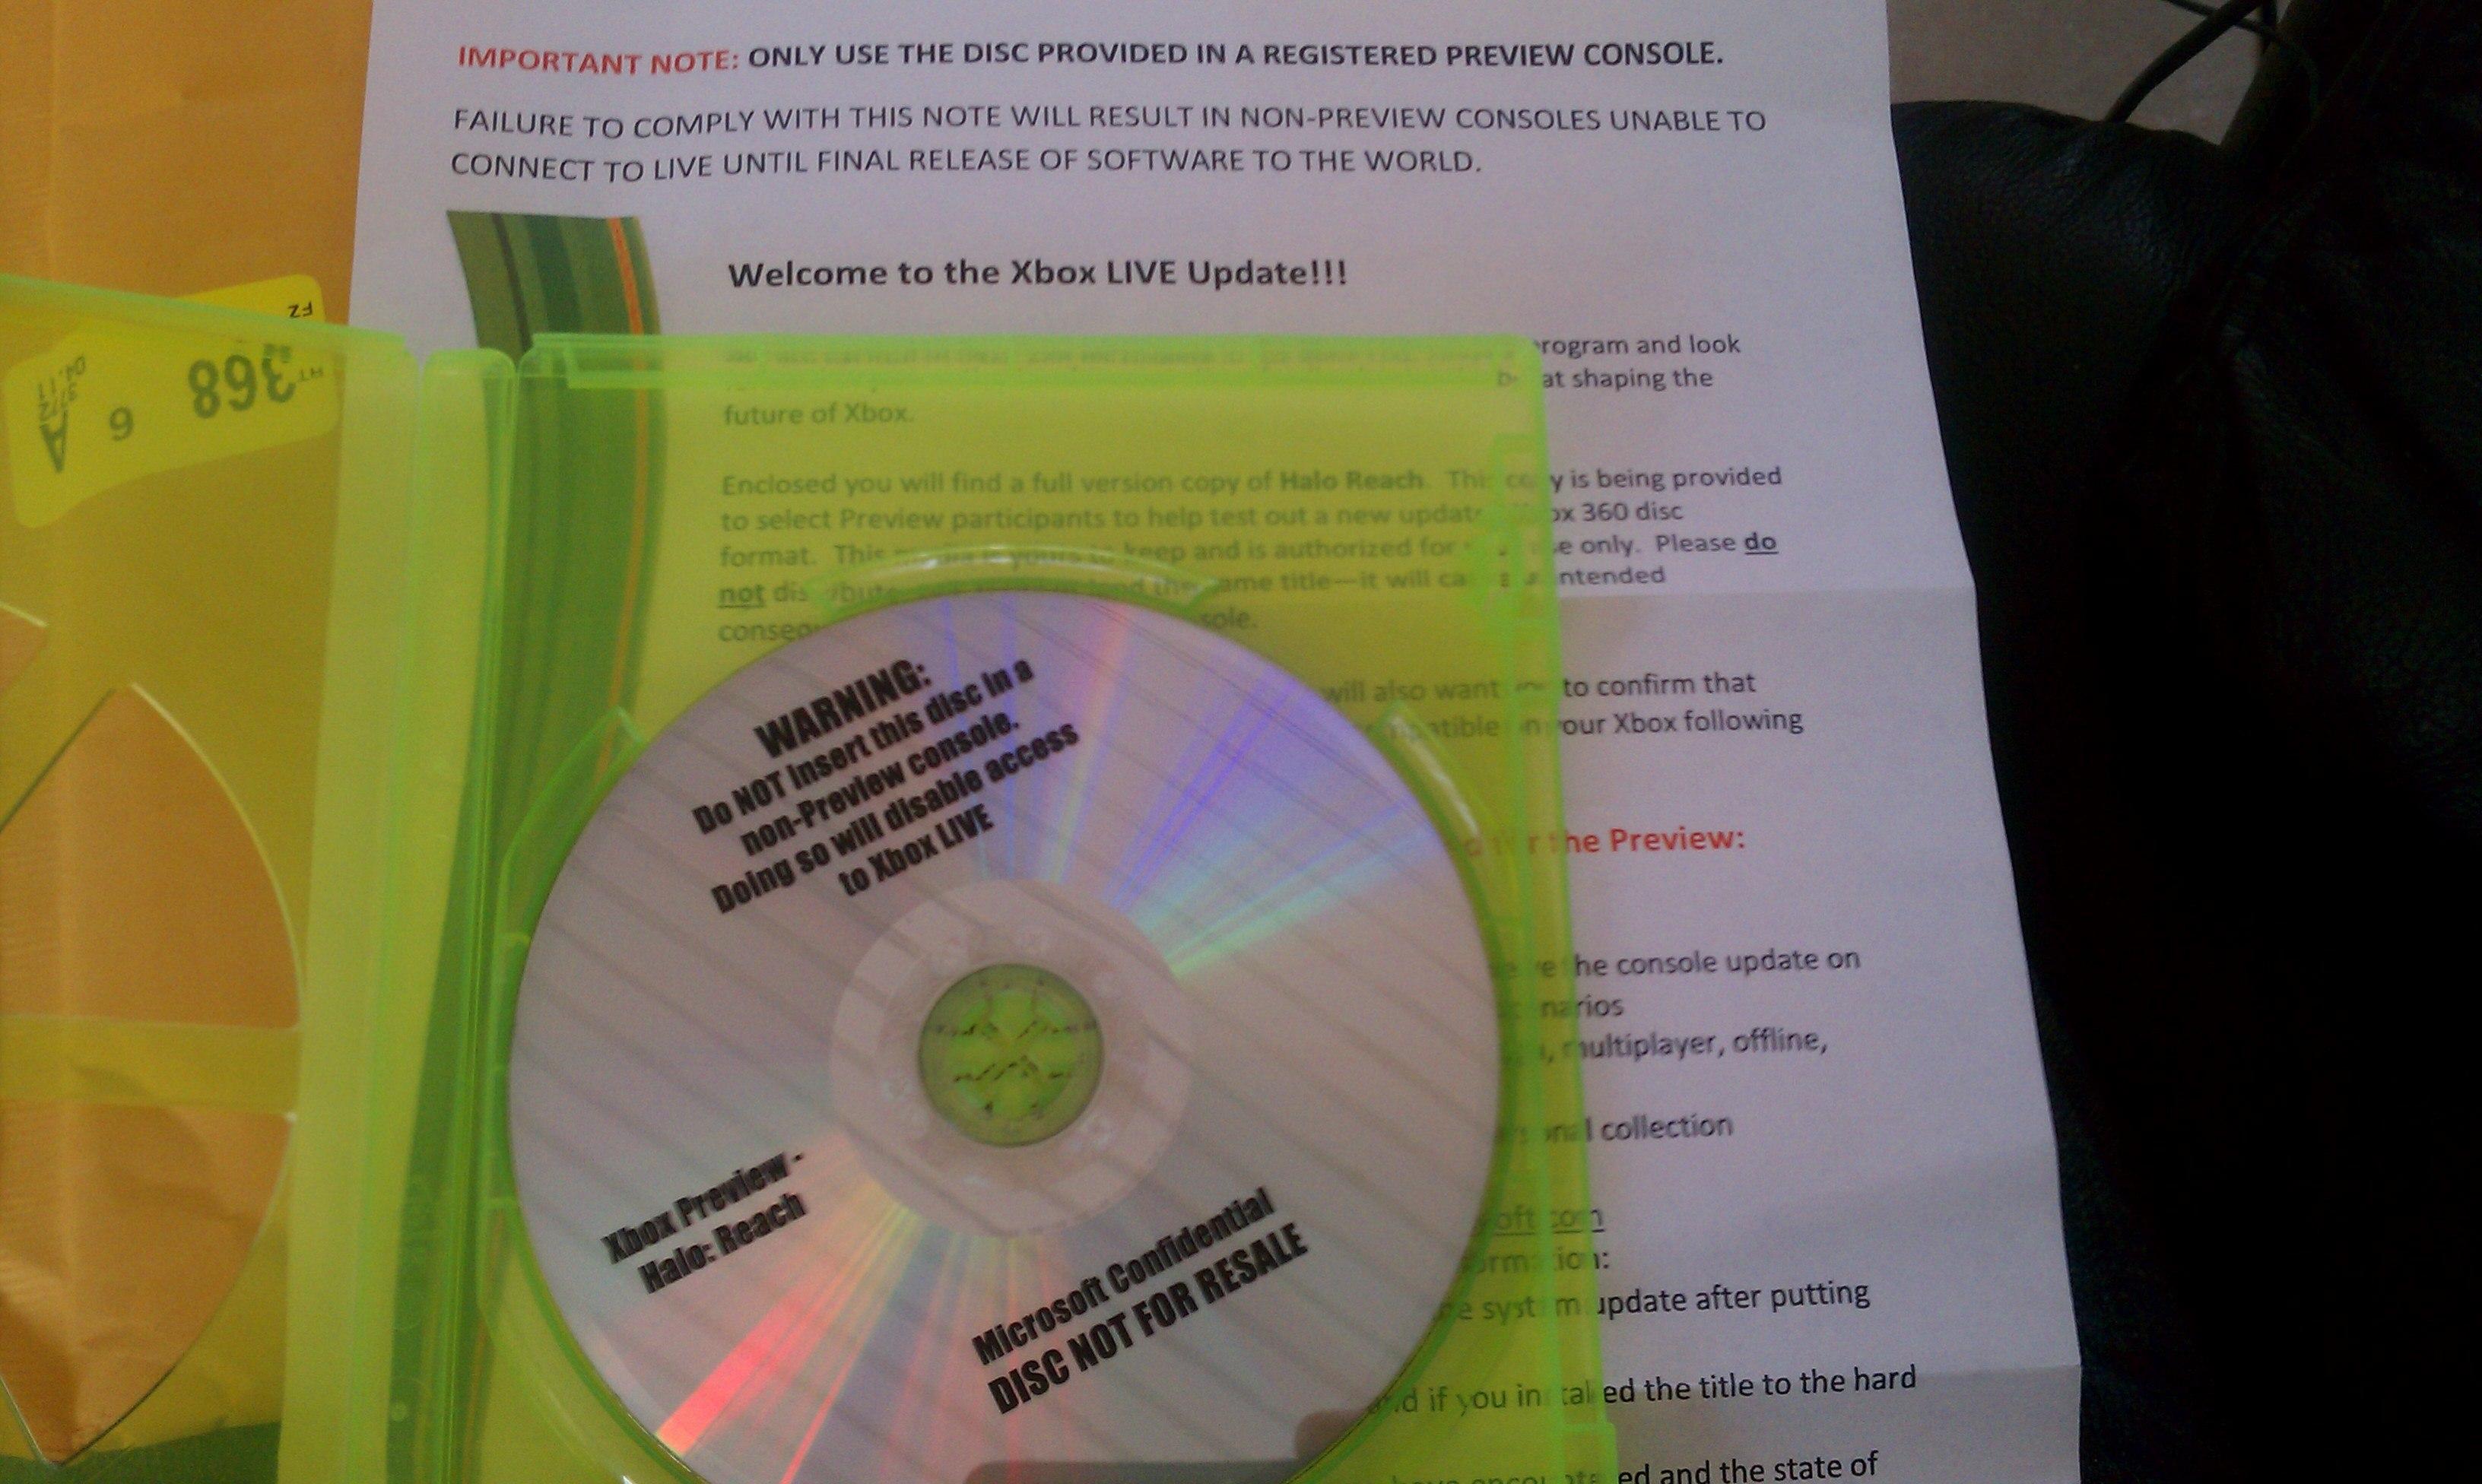 X-ex com - Xbox 360 new disc format beta discs arrive with